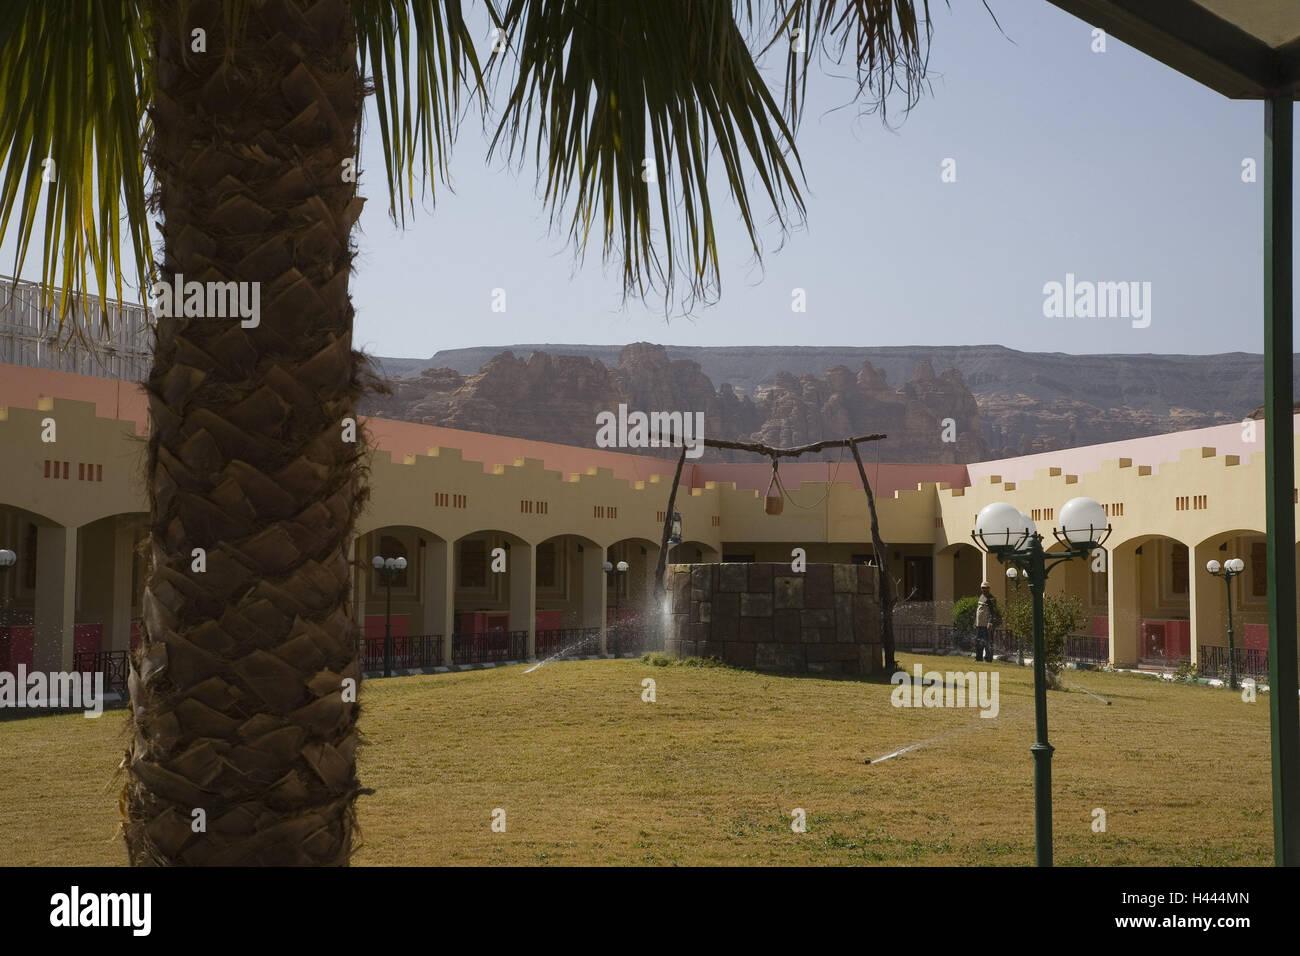 Saudi Arabia, Al-Ula, hotel 'Al Ula', inner courtyard, well, hotel, hotel facility, meadow, ornamental well, - Stock Image